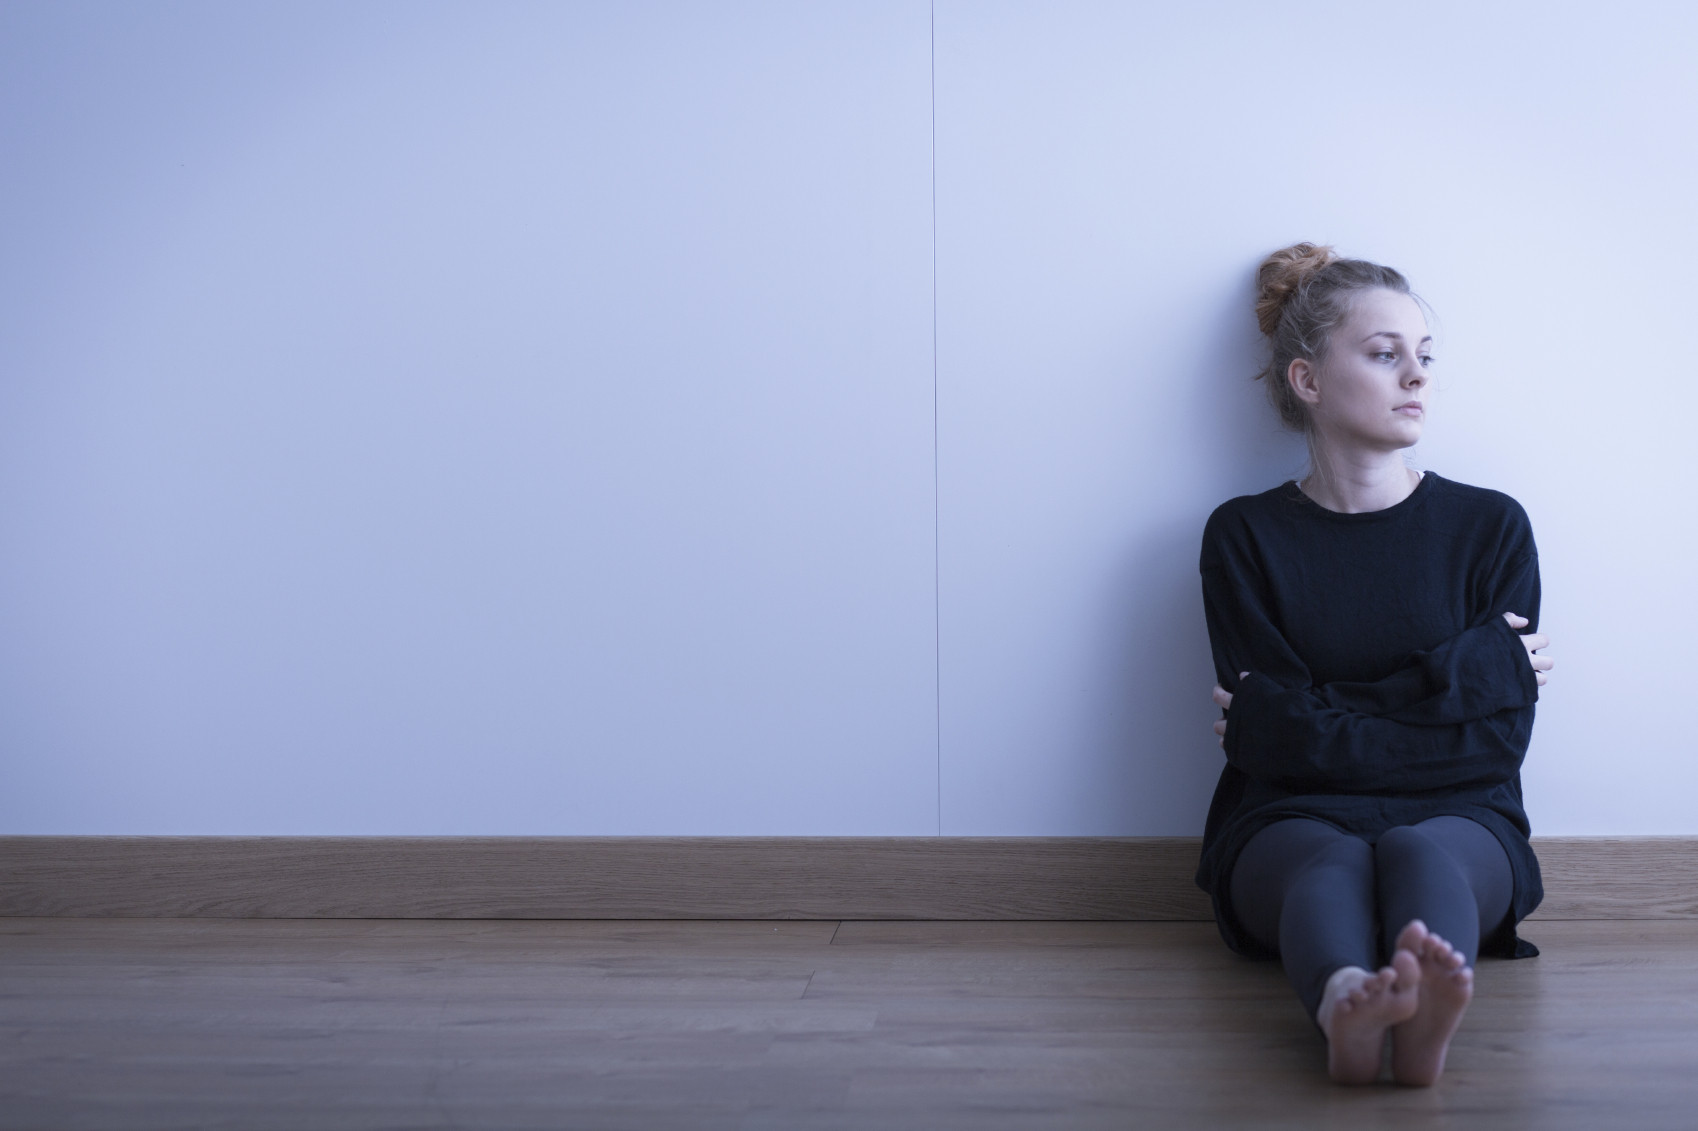 Depression-blog-02-04-16